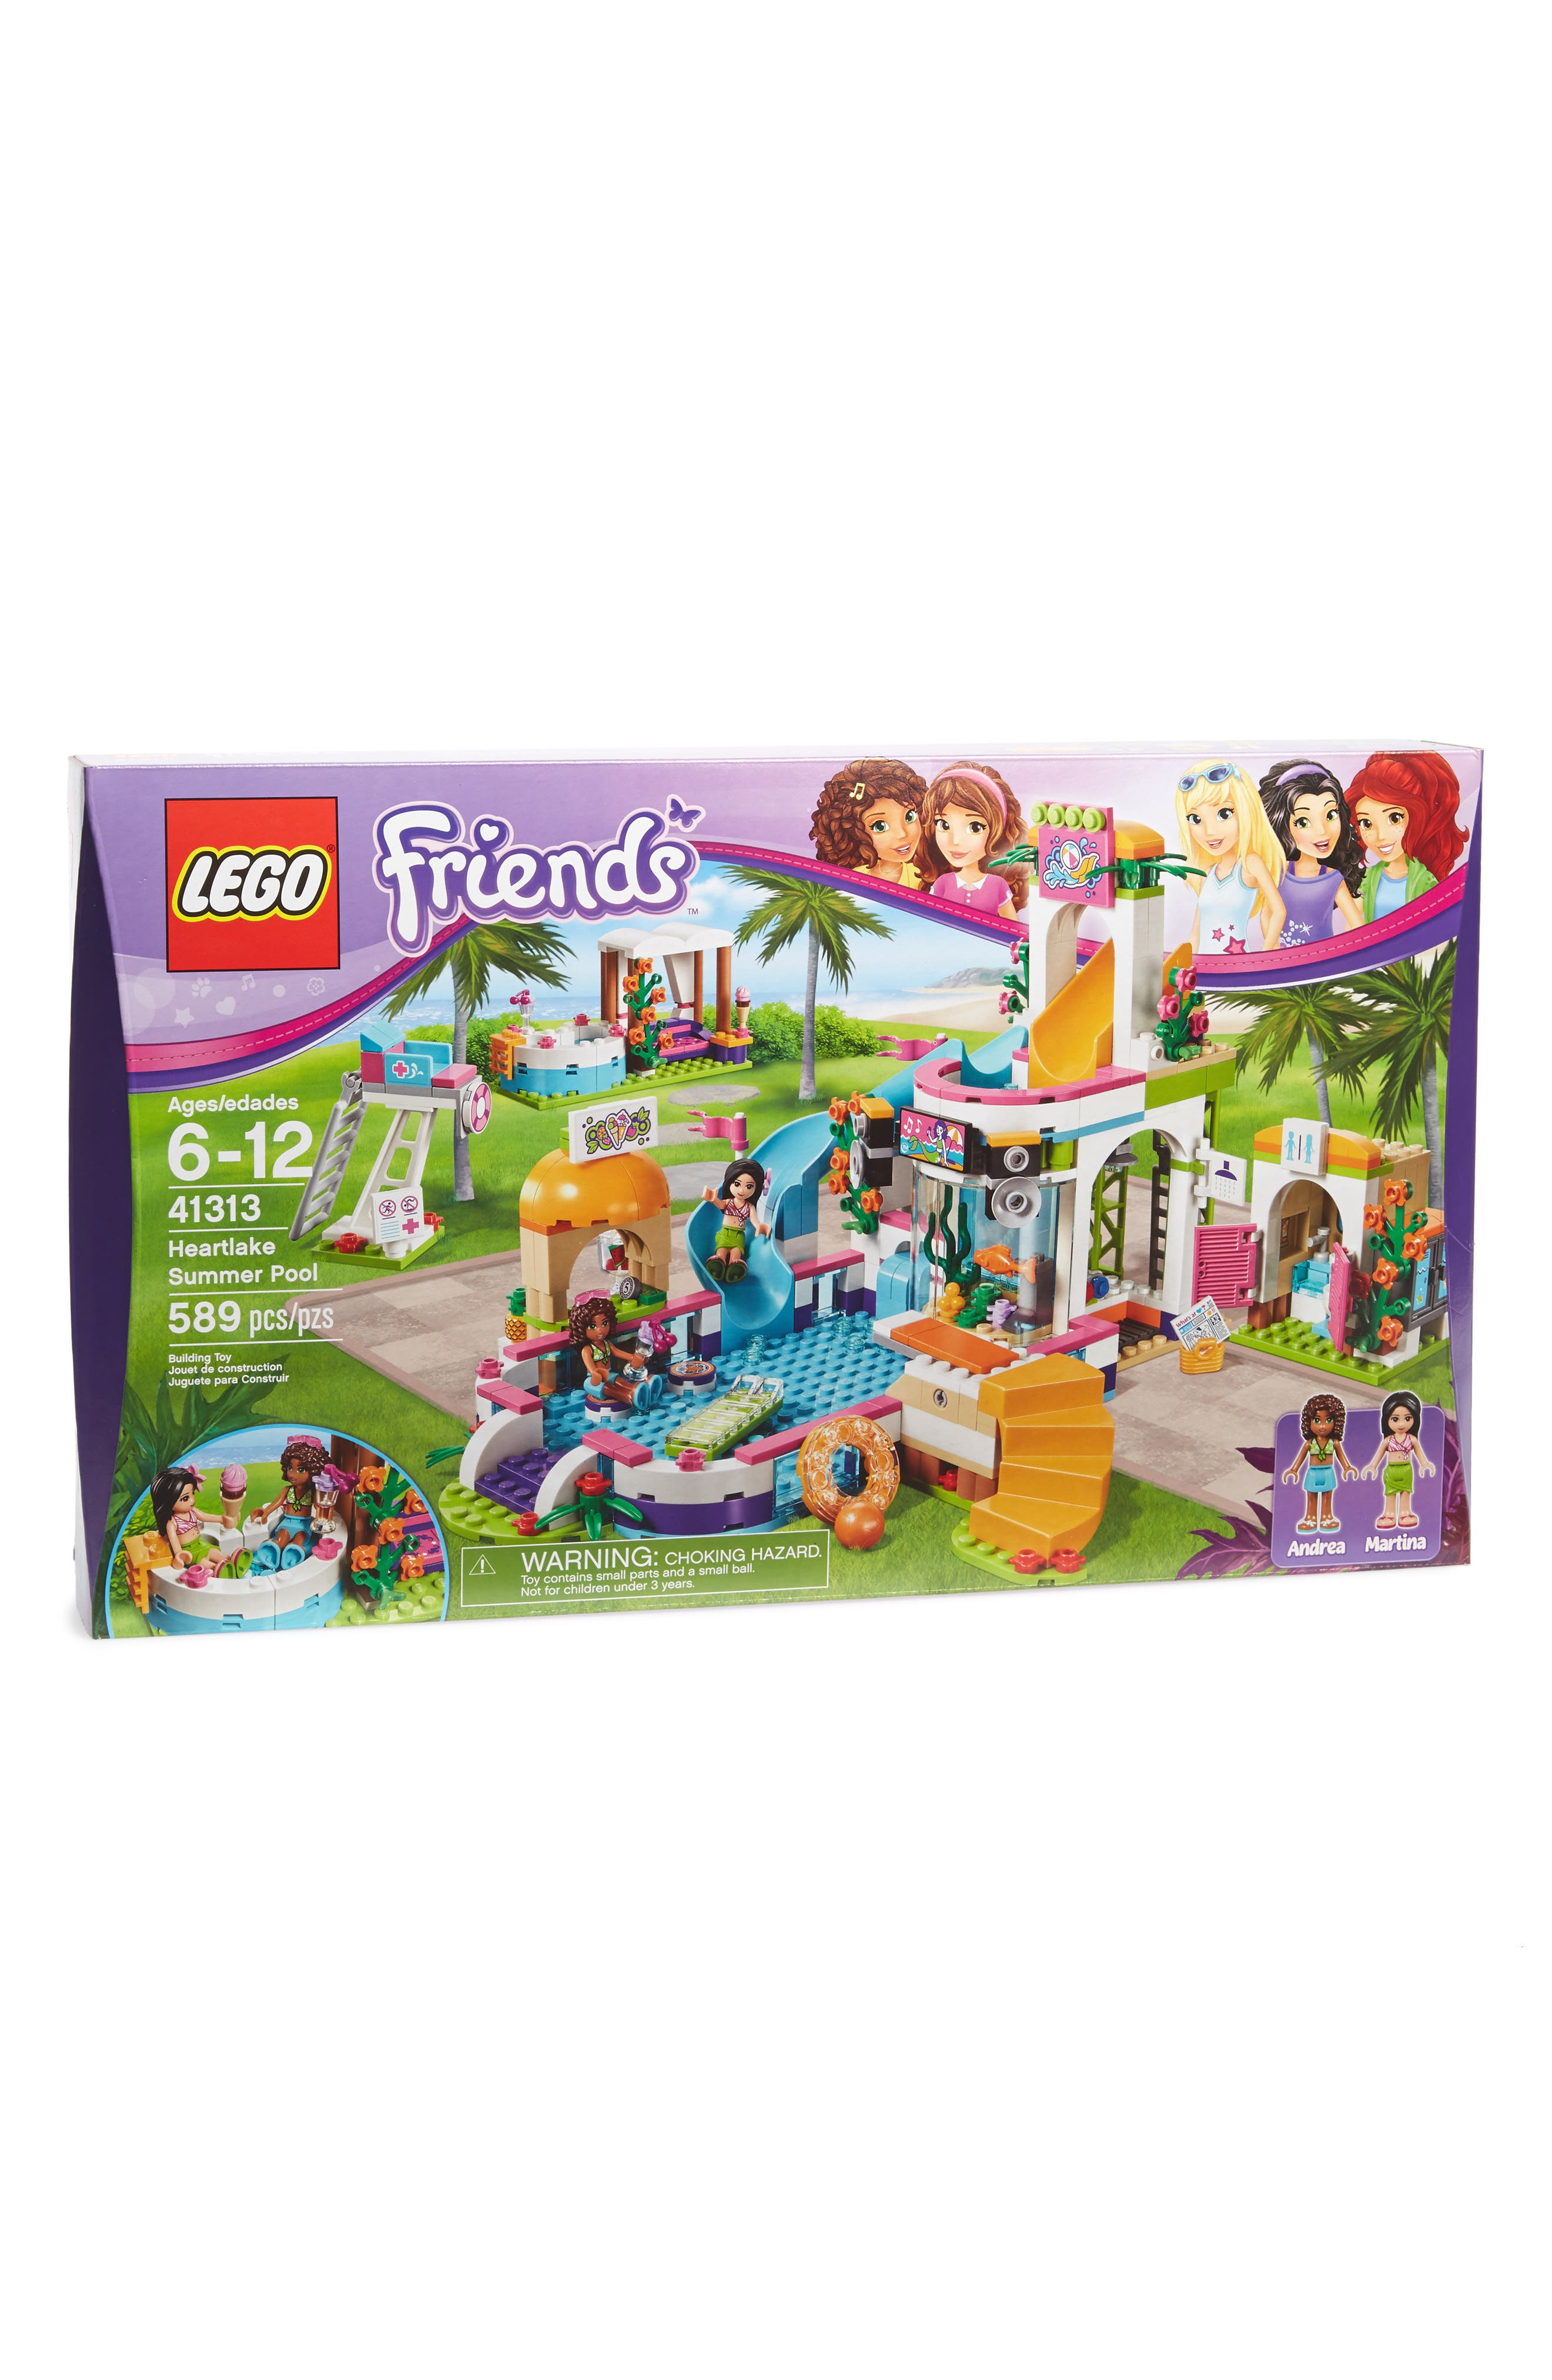 Friends<sup>™</sup> Heartlake Summer Pool - 41313,                             Main thumbnail 1, color,                             500